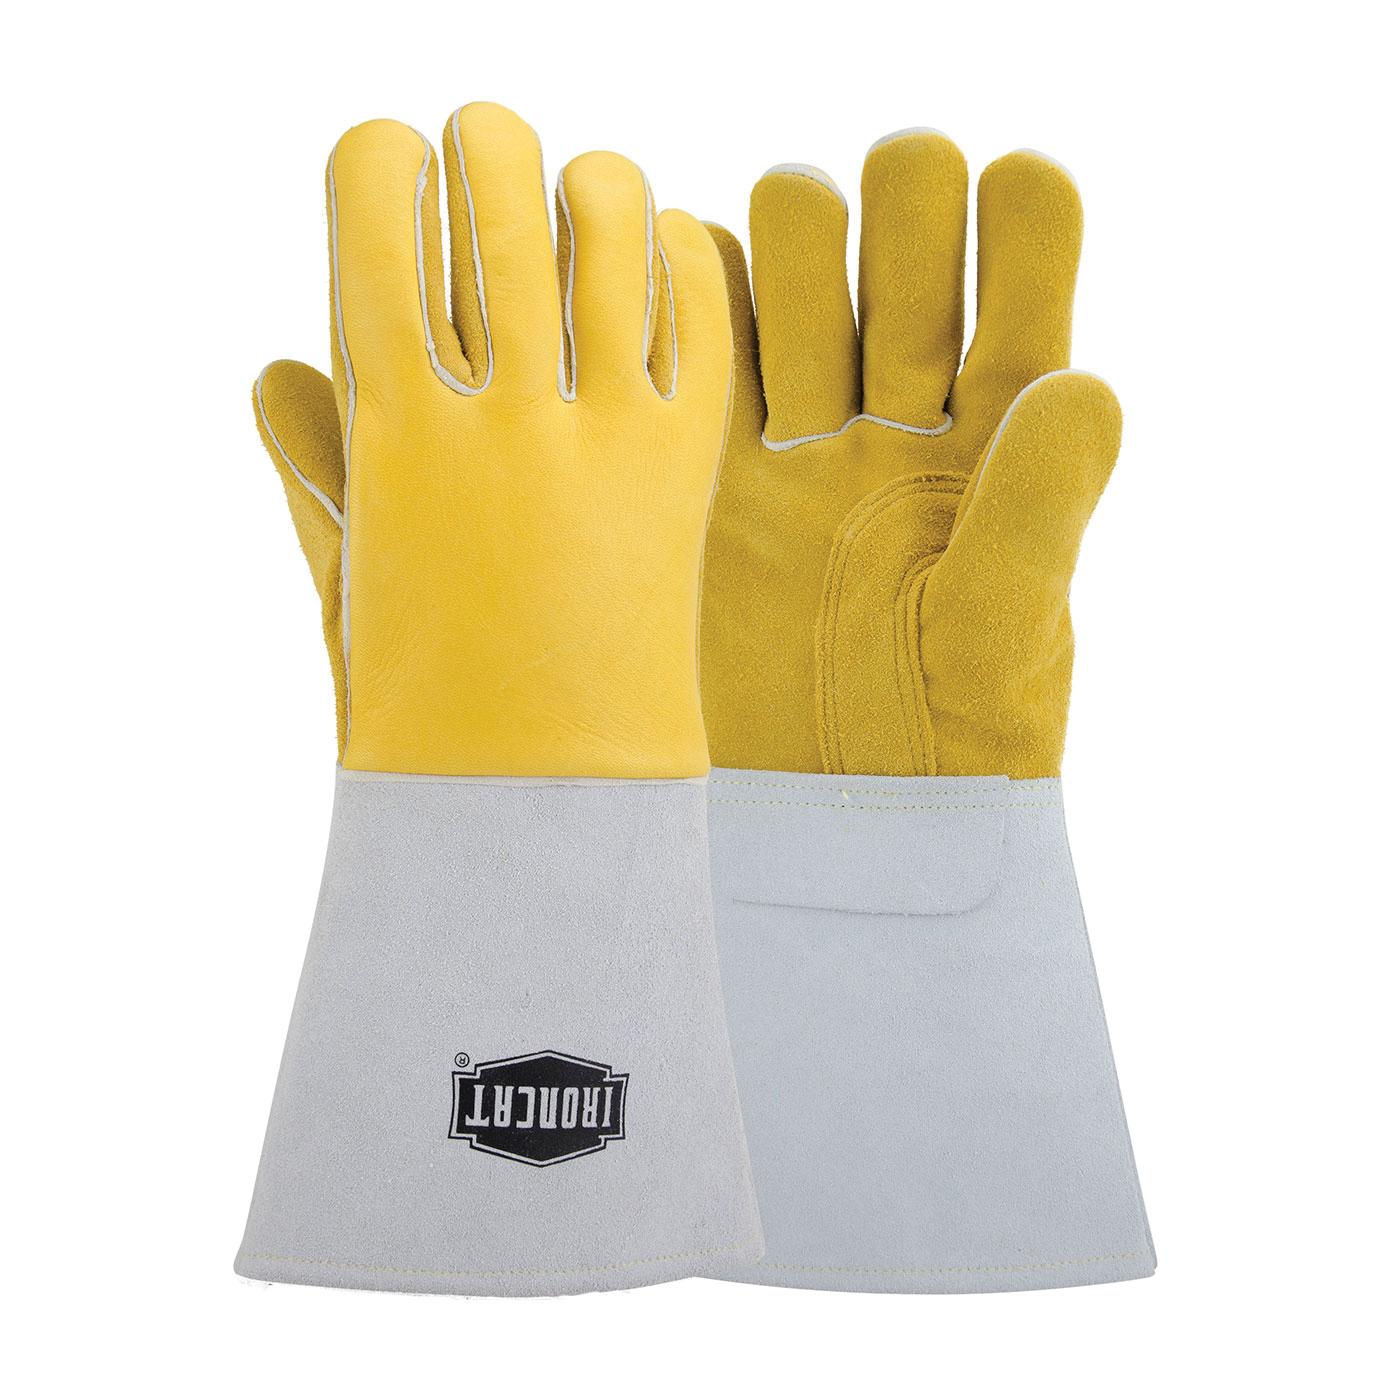 Ironcat® 9060/L Welding Gloves, L, Premium Grain Top Grain Elkskin Leather/Kevlar® Thread, Yellow, Cotton/Foam Lining, Gauntlet Cuff, 14 in L